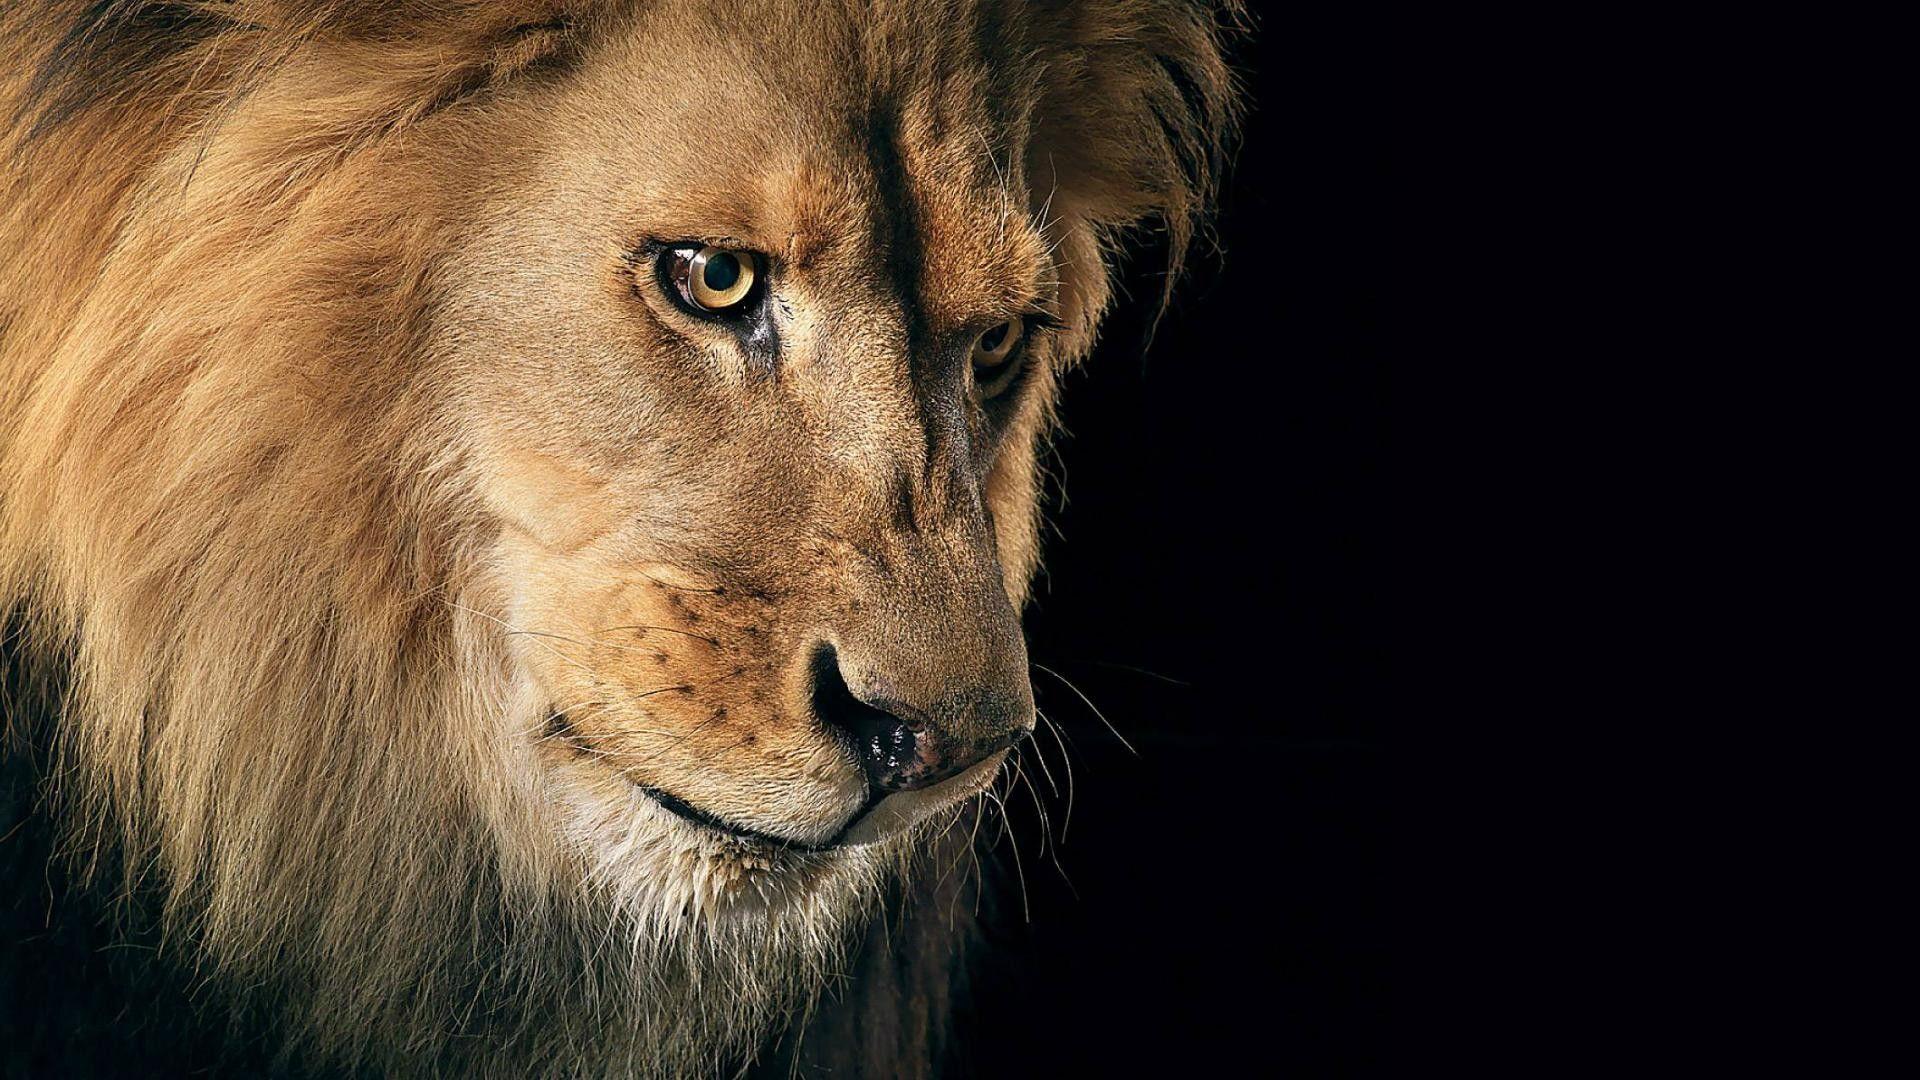 sad lion hd 1080p wallpapers download | stuff to buy | pinterest